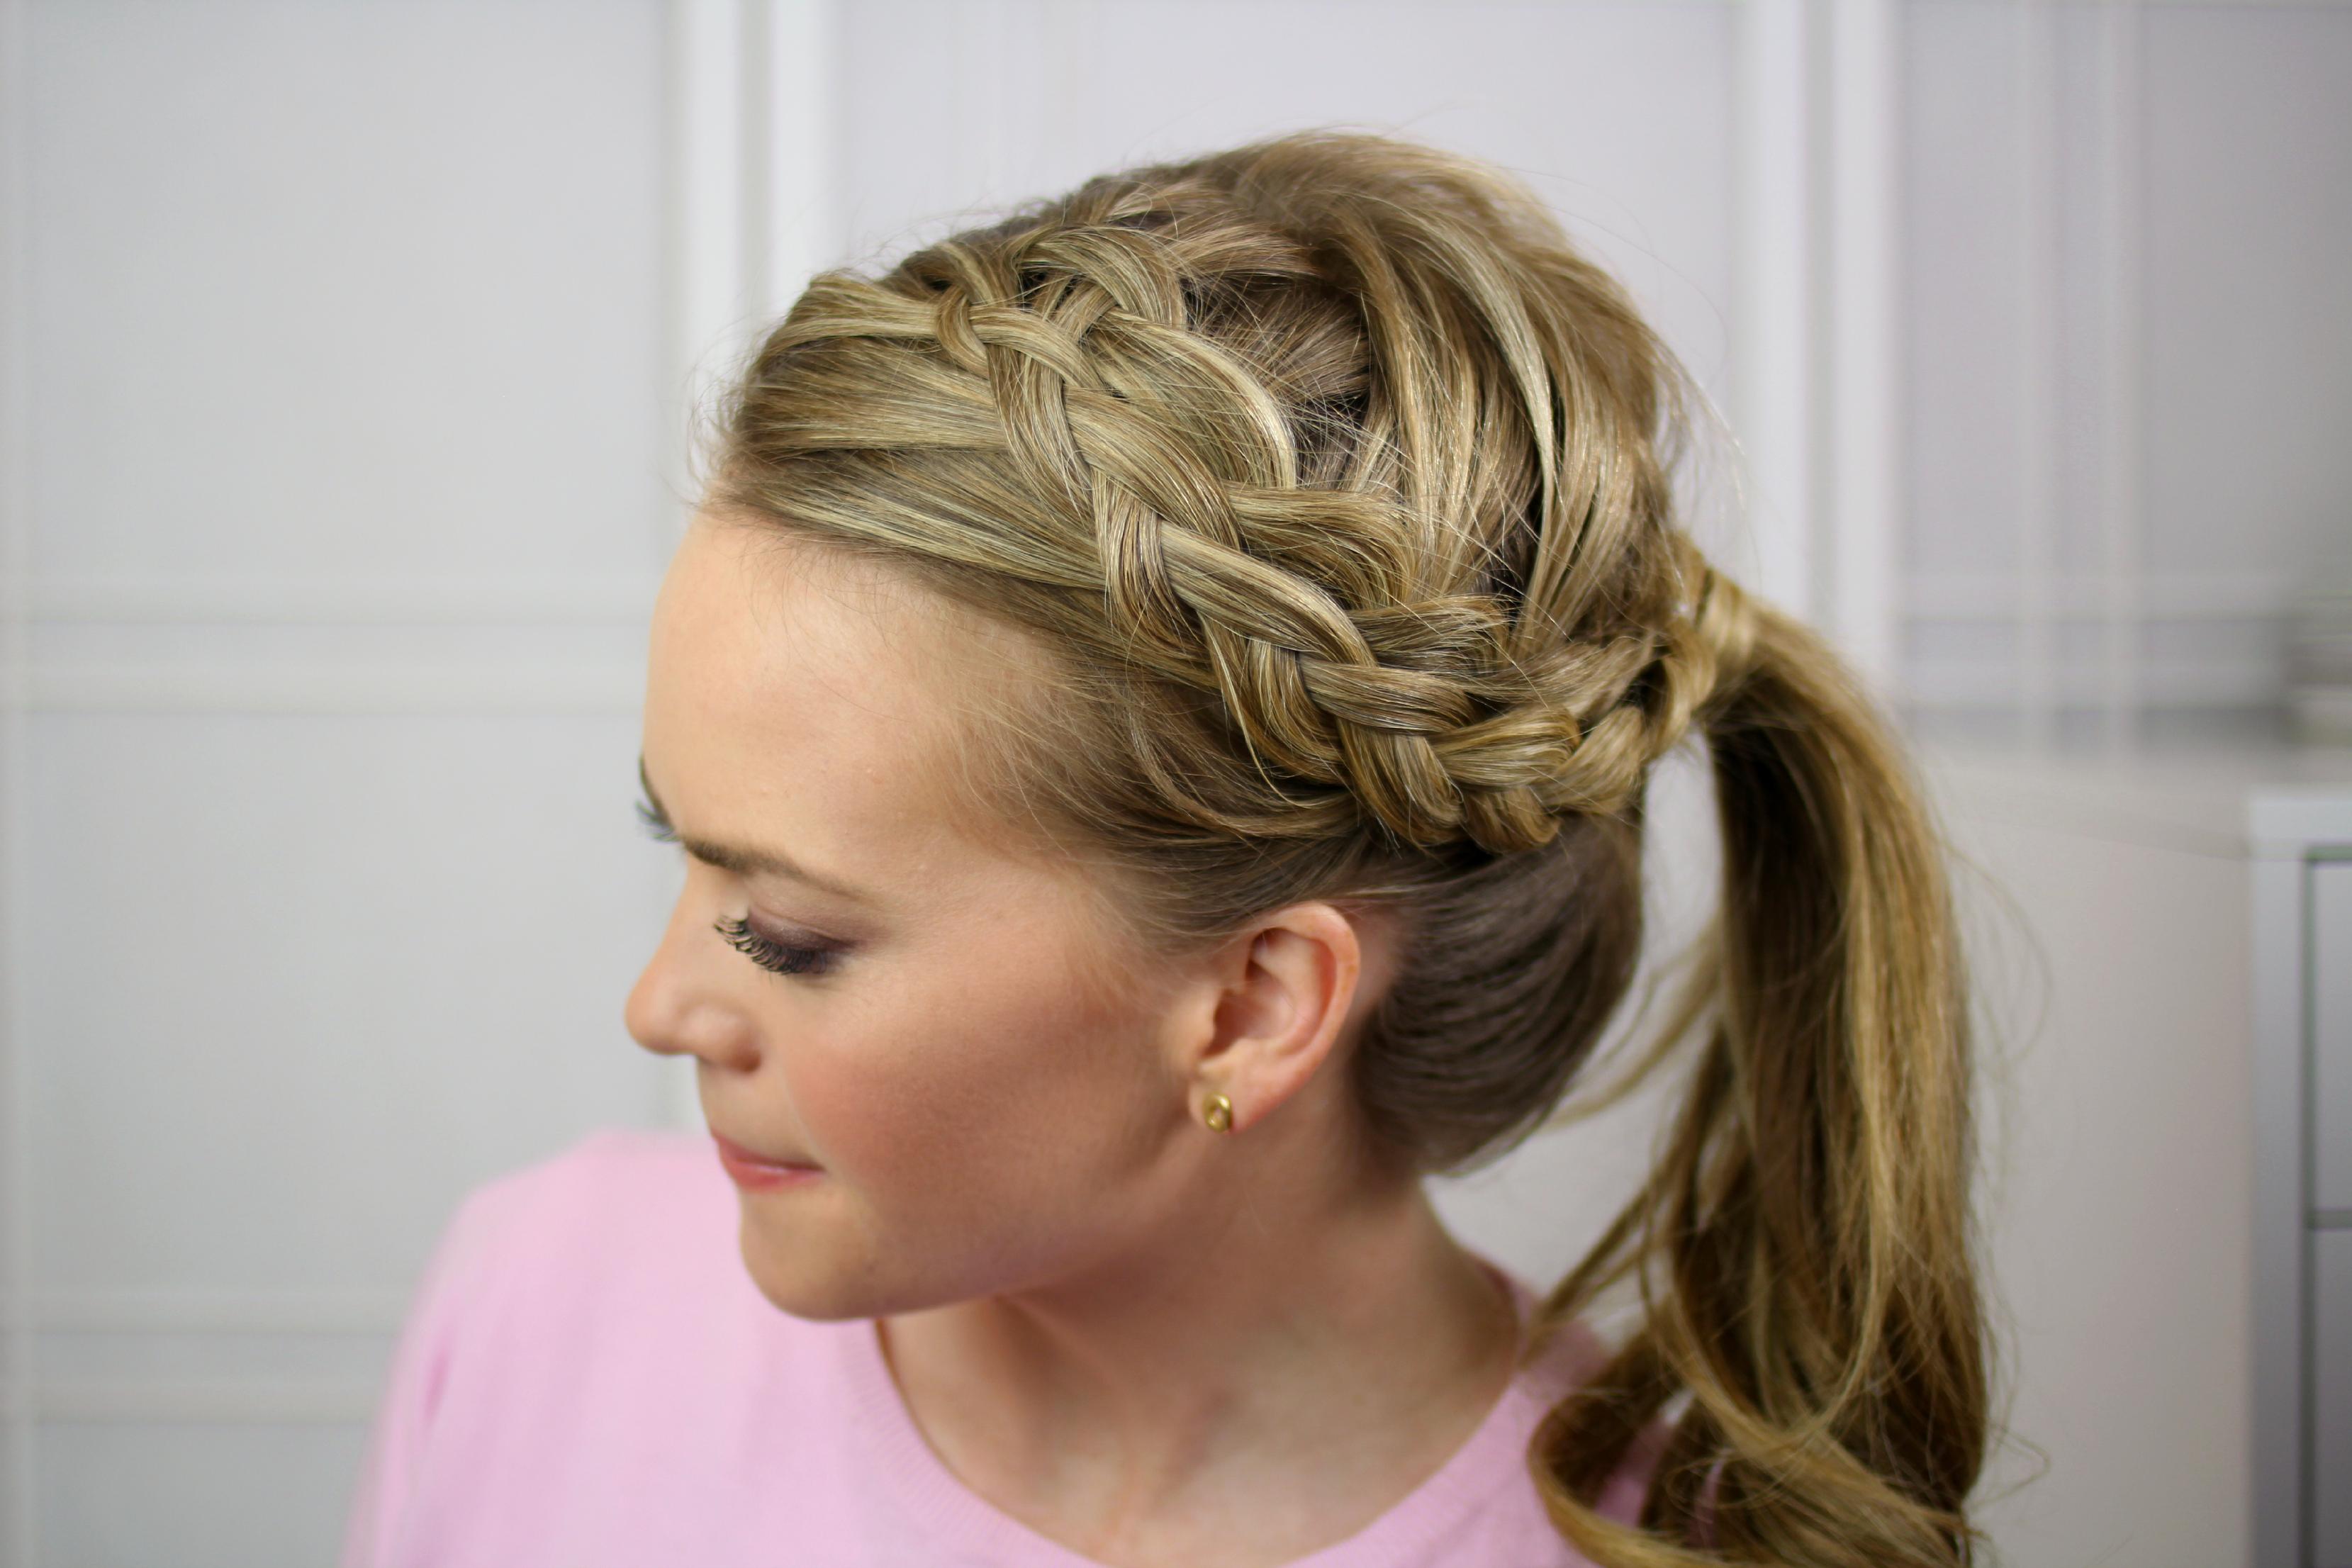 Braid 19-Double Woven Headband Braid | MISSY SUE